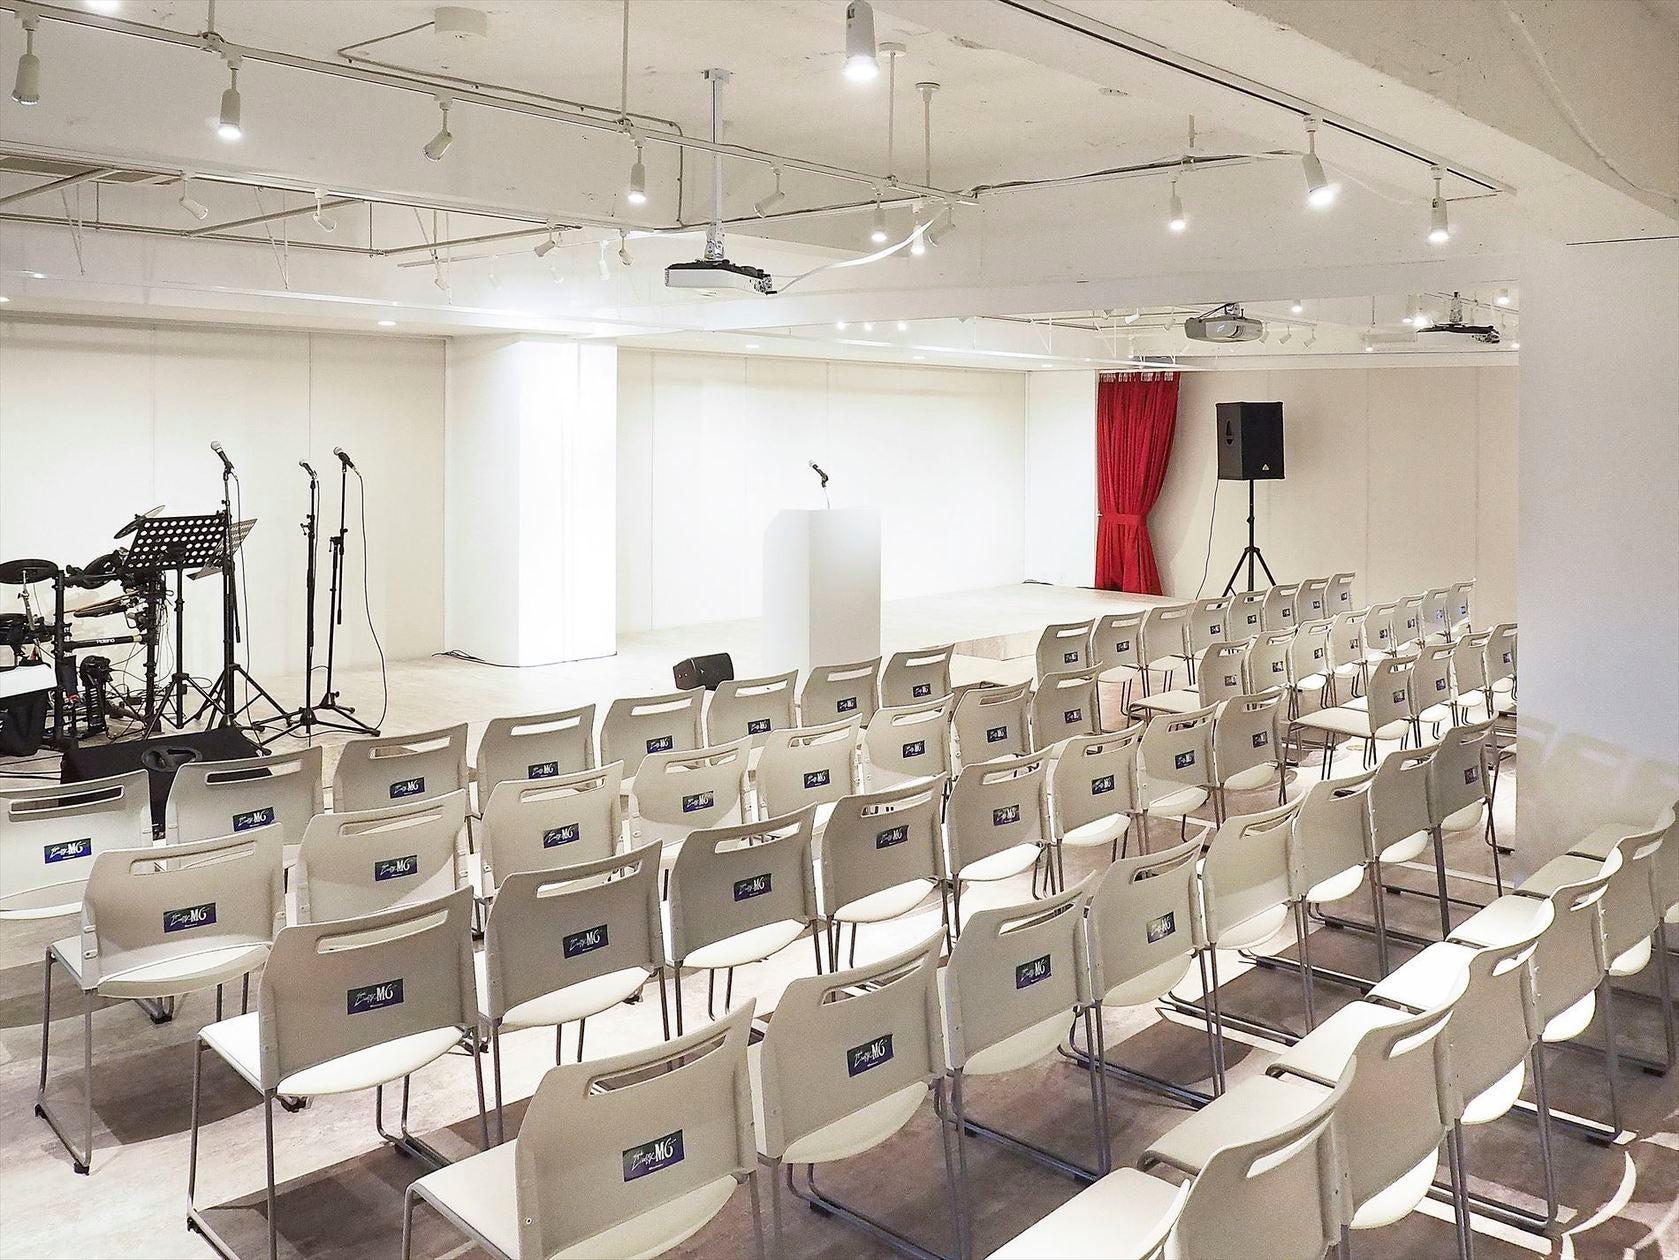 【JR根岸駅徒歩1分】[M6ABCD]ホール・スタジオ・スペースでLIVE・会議・展示会できます!